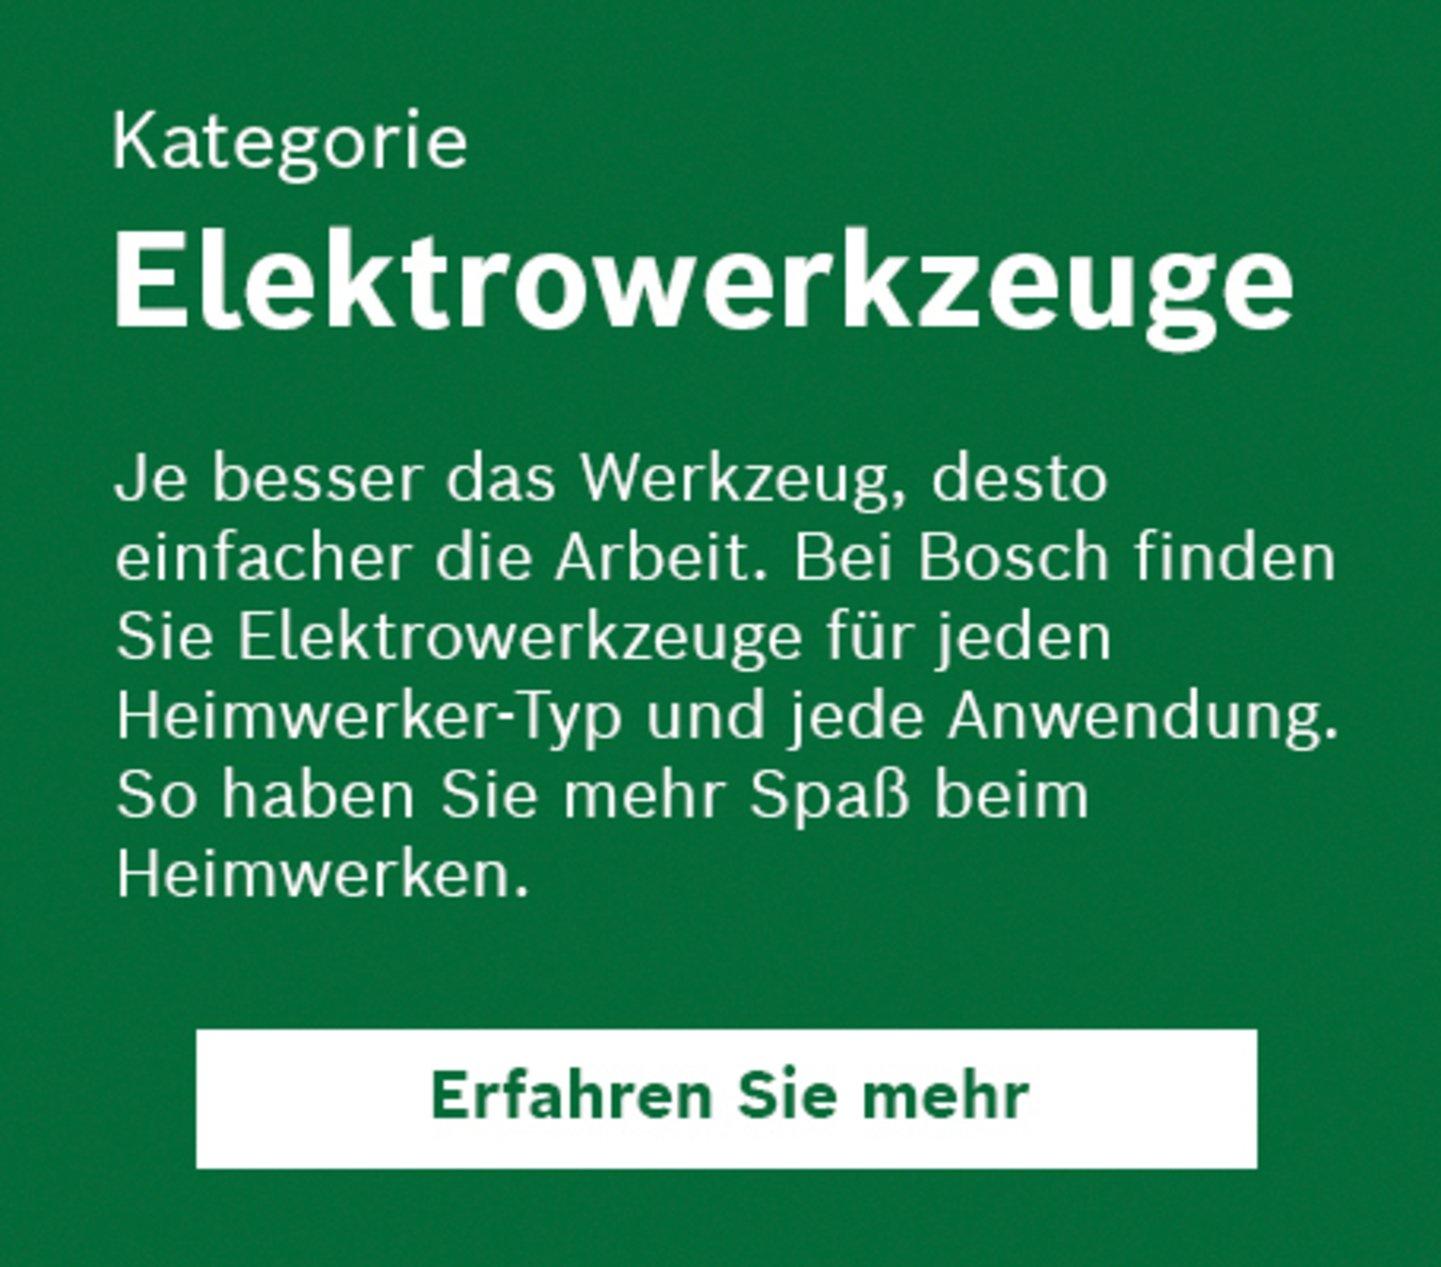 Elektrowerkzeuge